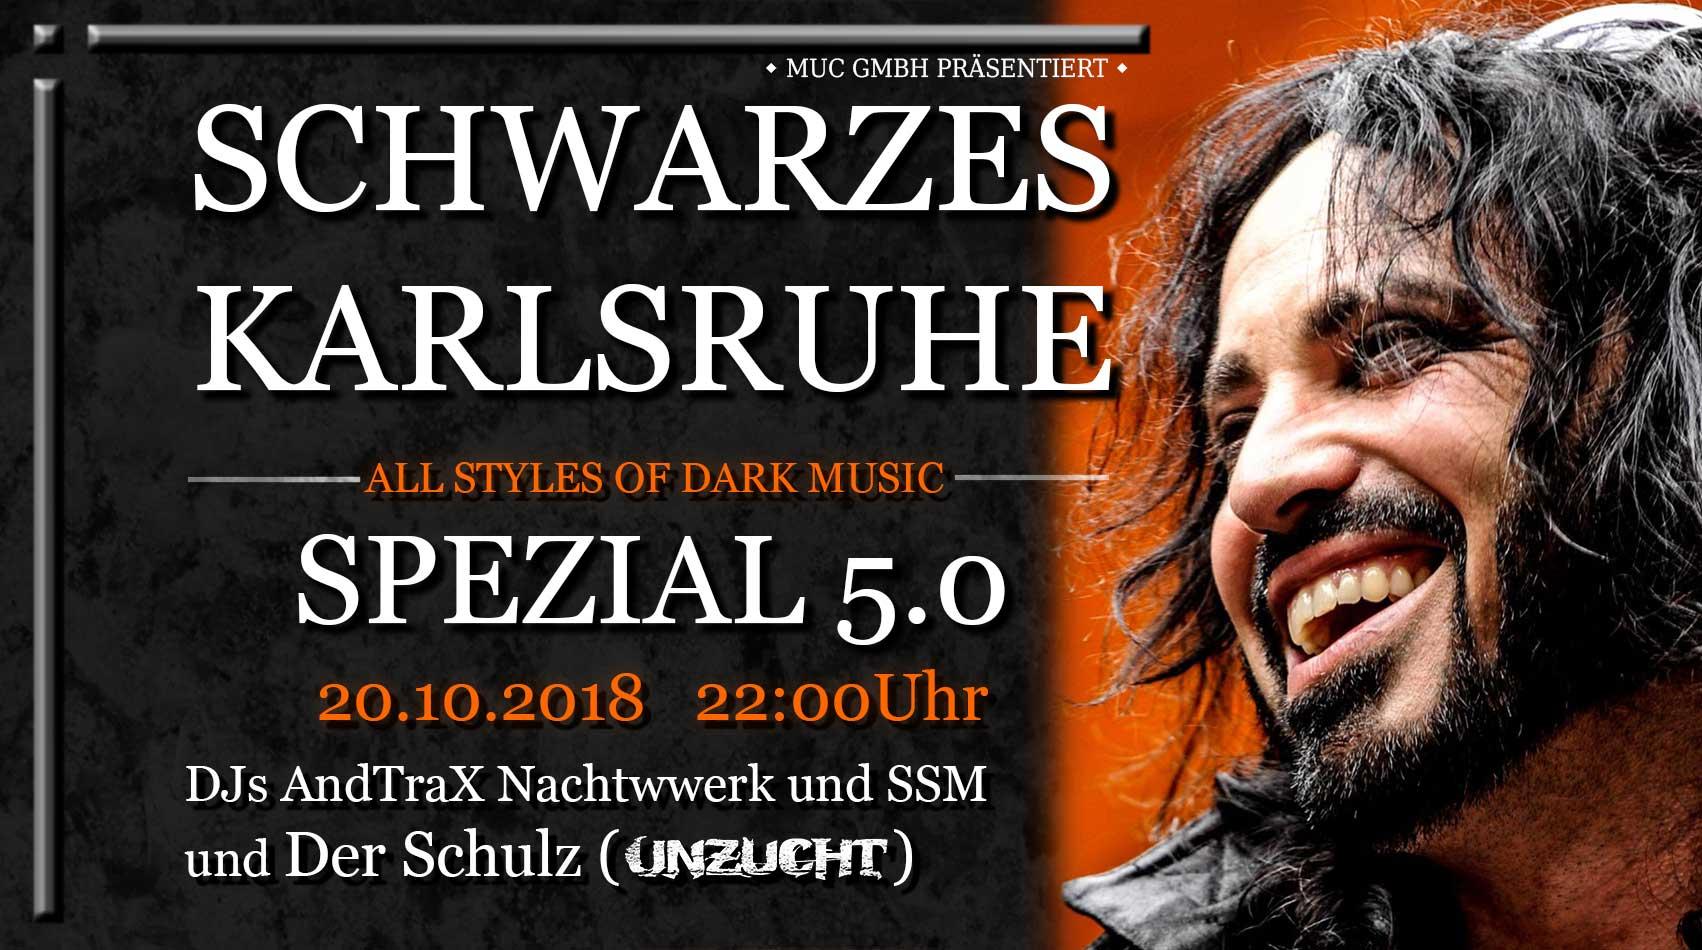 Schwarzes Karlsruhe Spezial 5